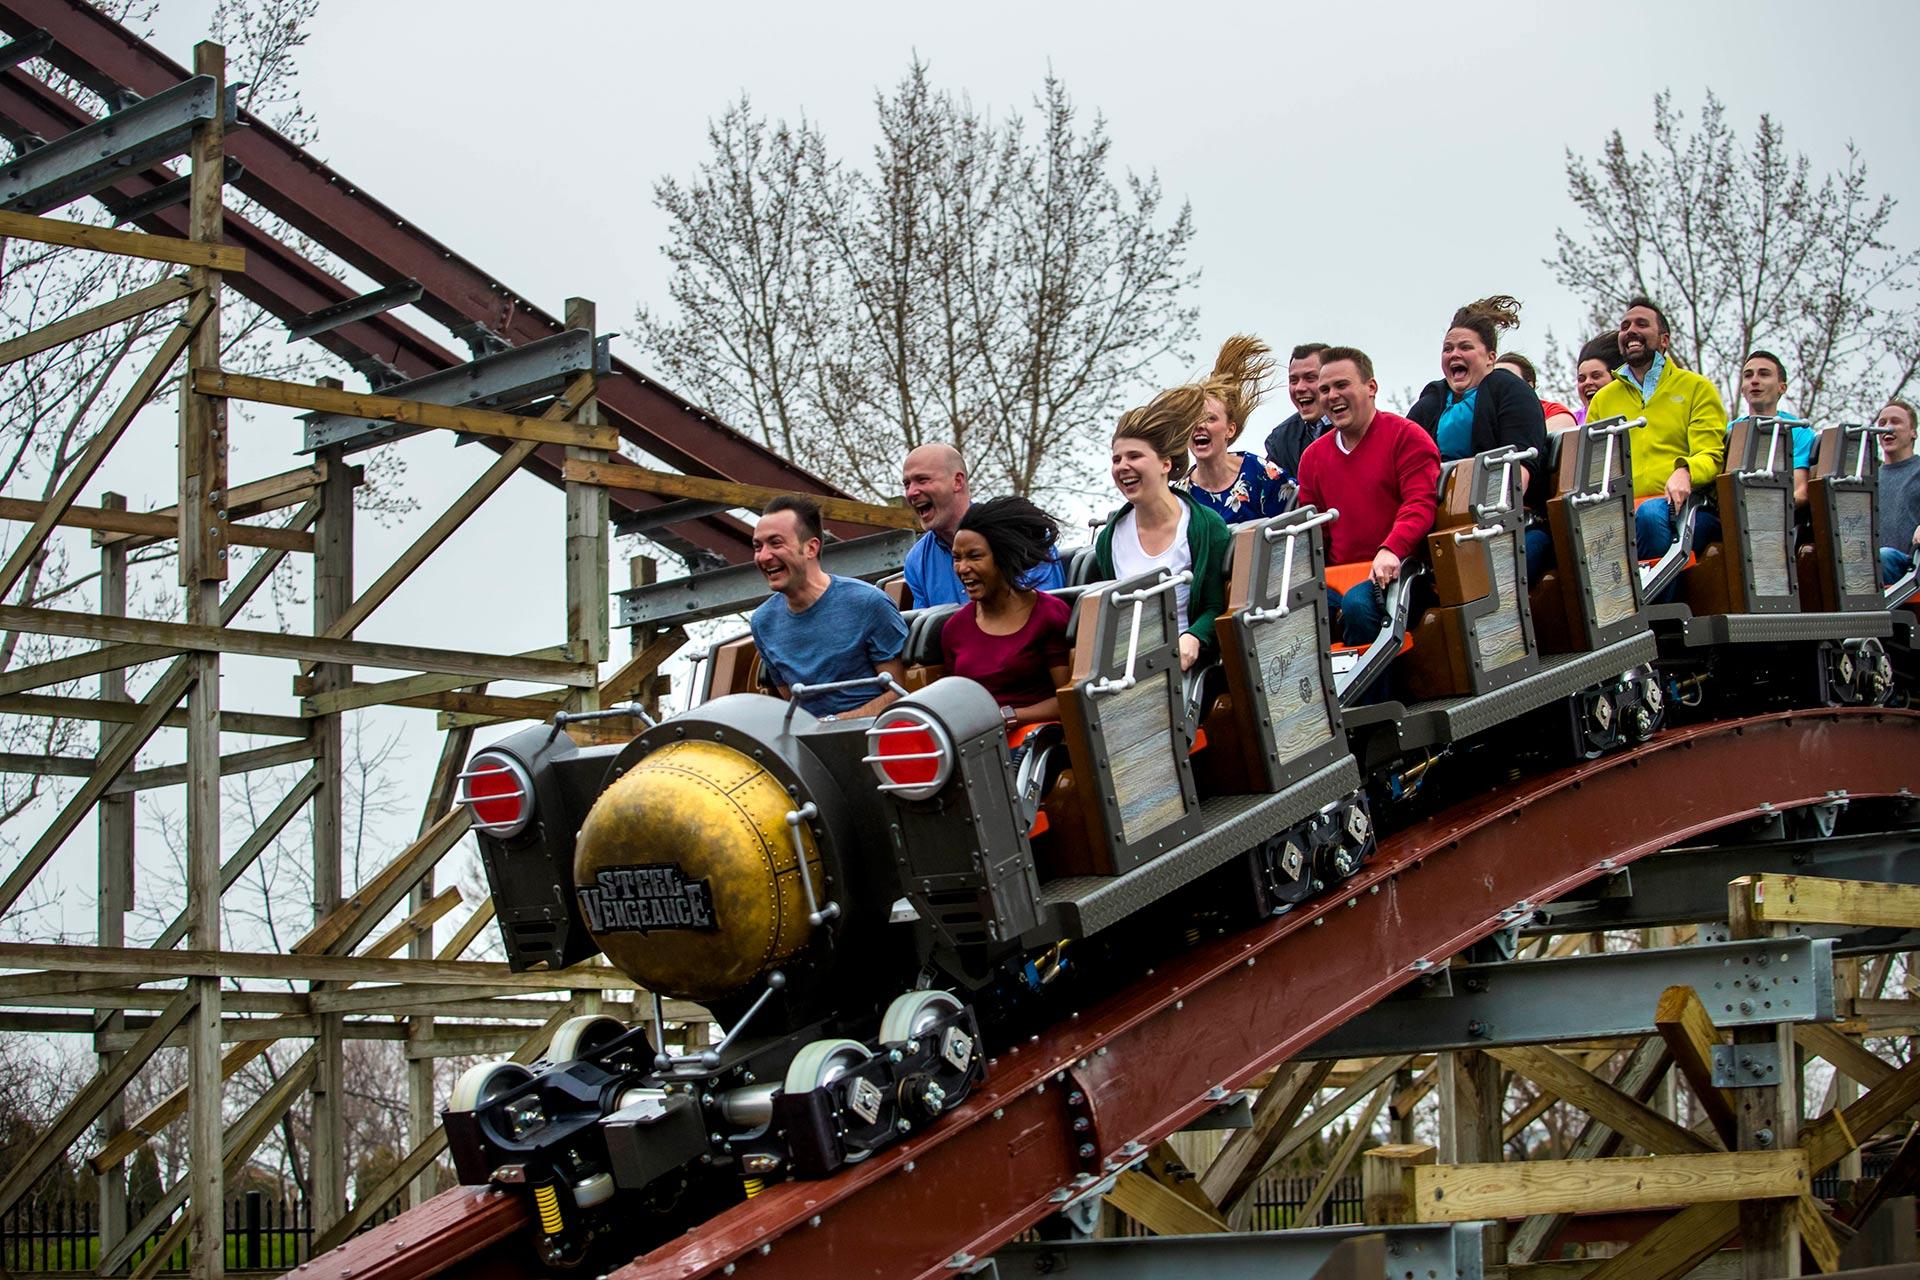 Steel Vengeance at Cedar Point in Ohio